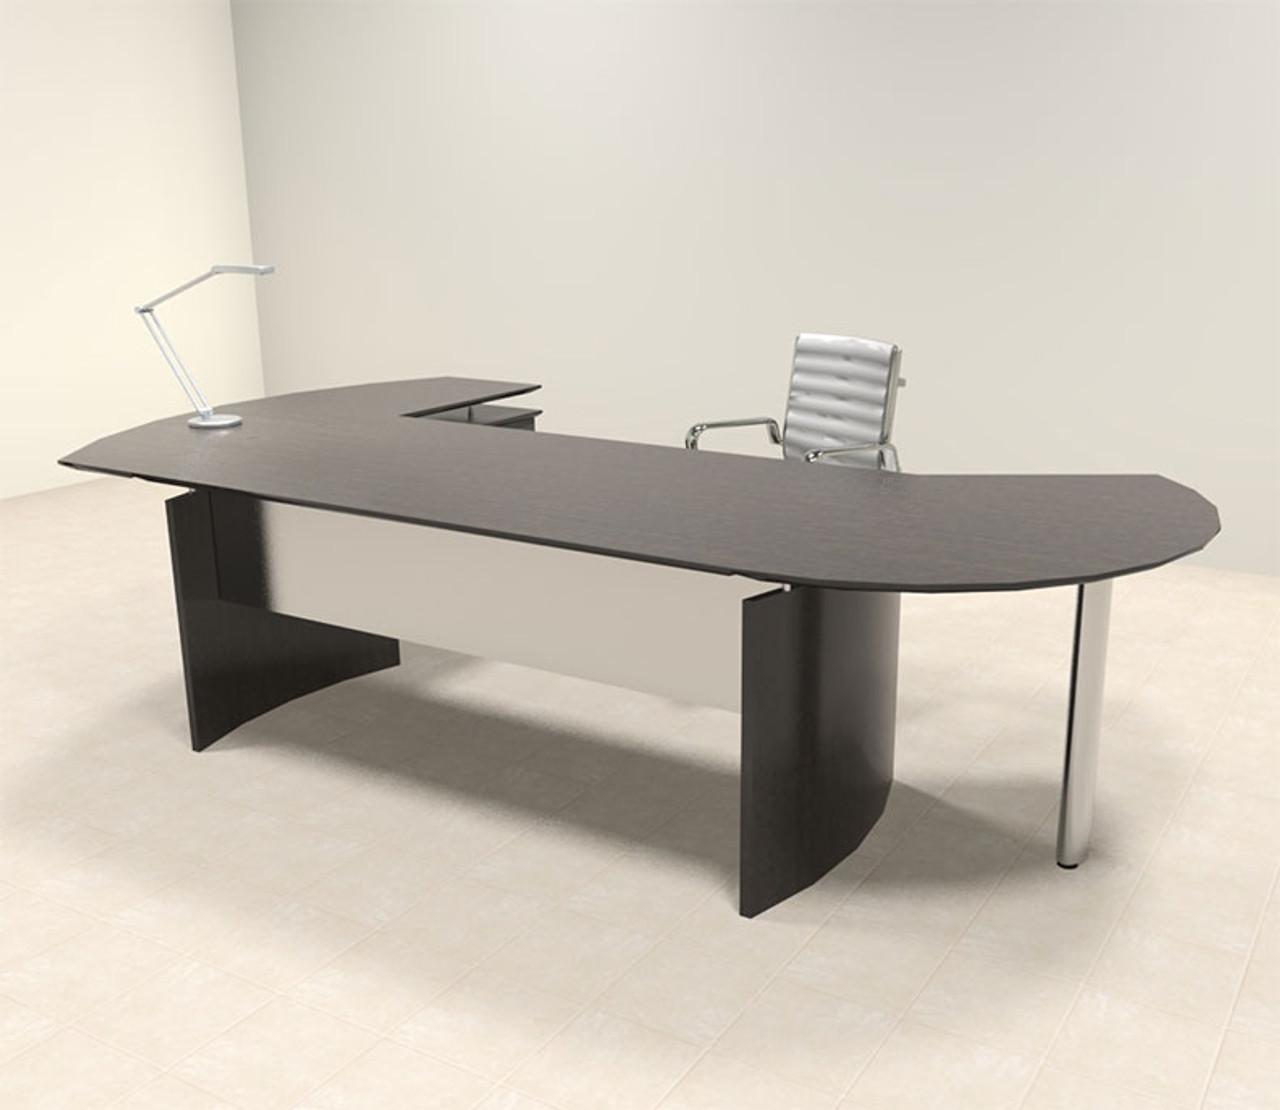 3pc Modern Contemporary Oval Executive Office Desk Set, #MT-MED-O3